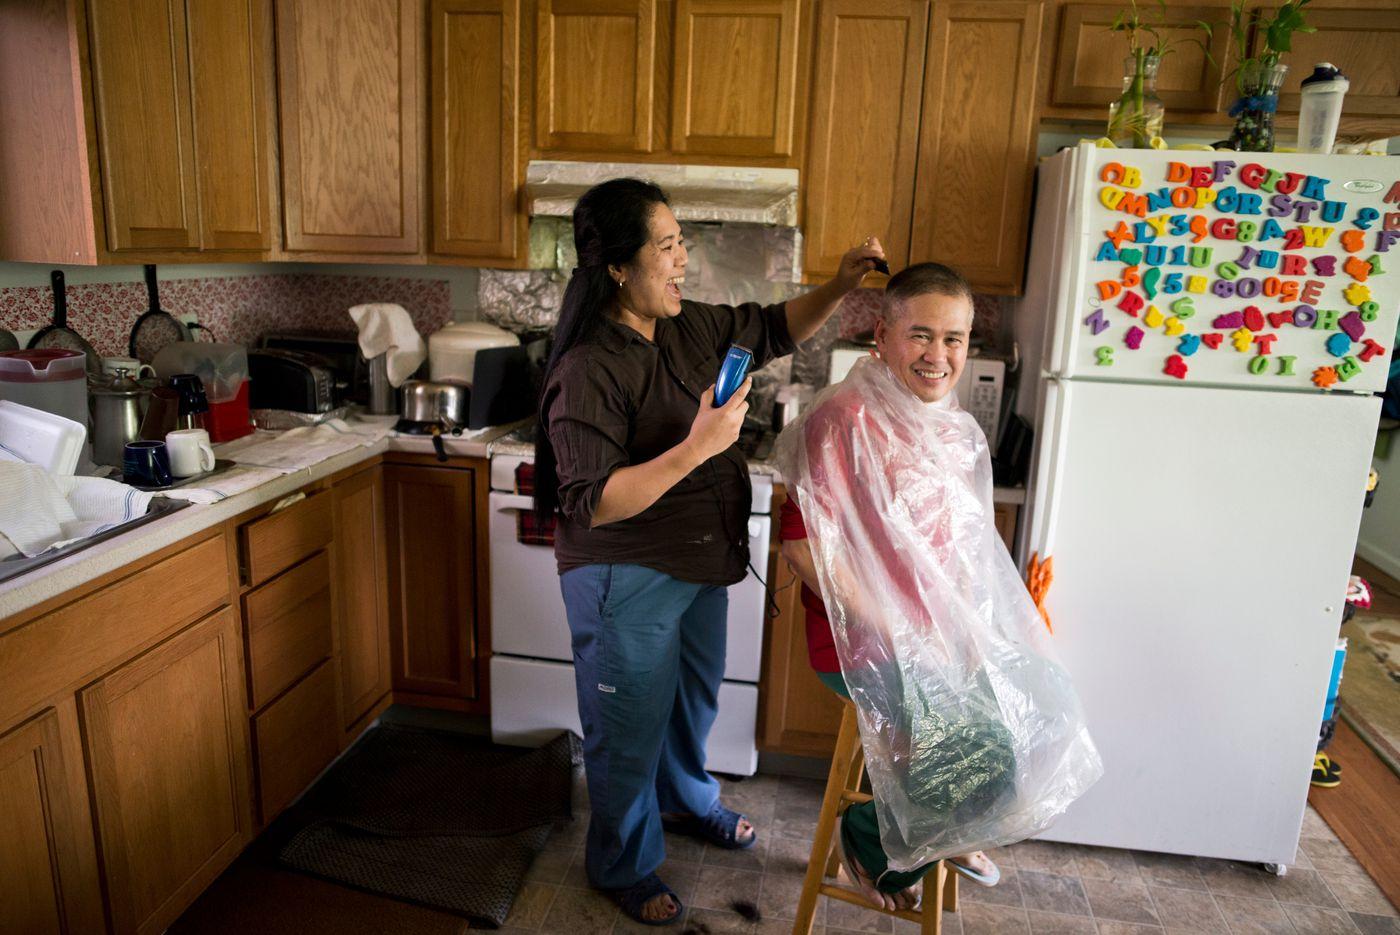 Eden and Roger Manalo, photographed on Thursday, September 29, 2016.(Marc Lester / Alaska Dispatch News)